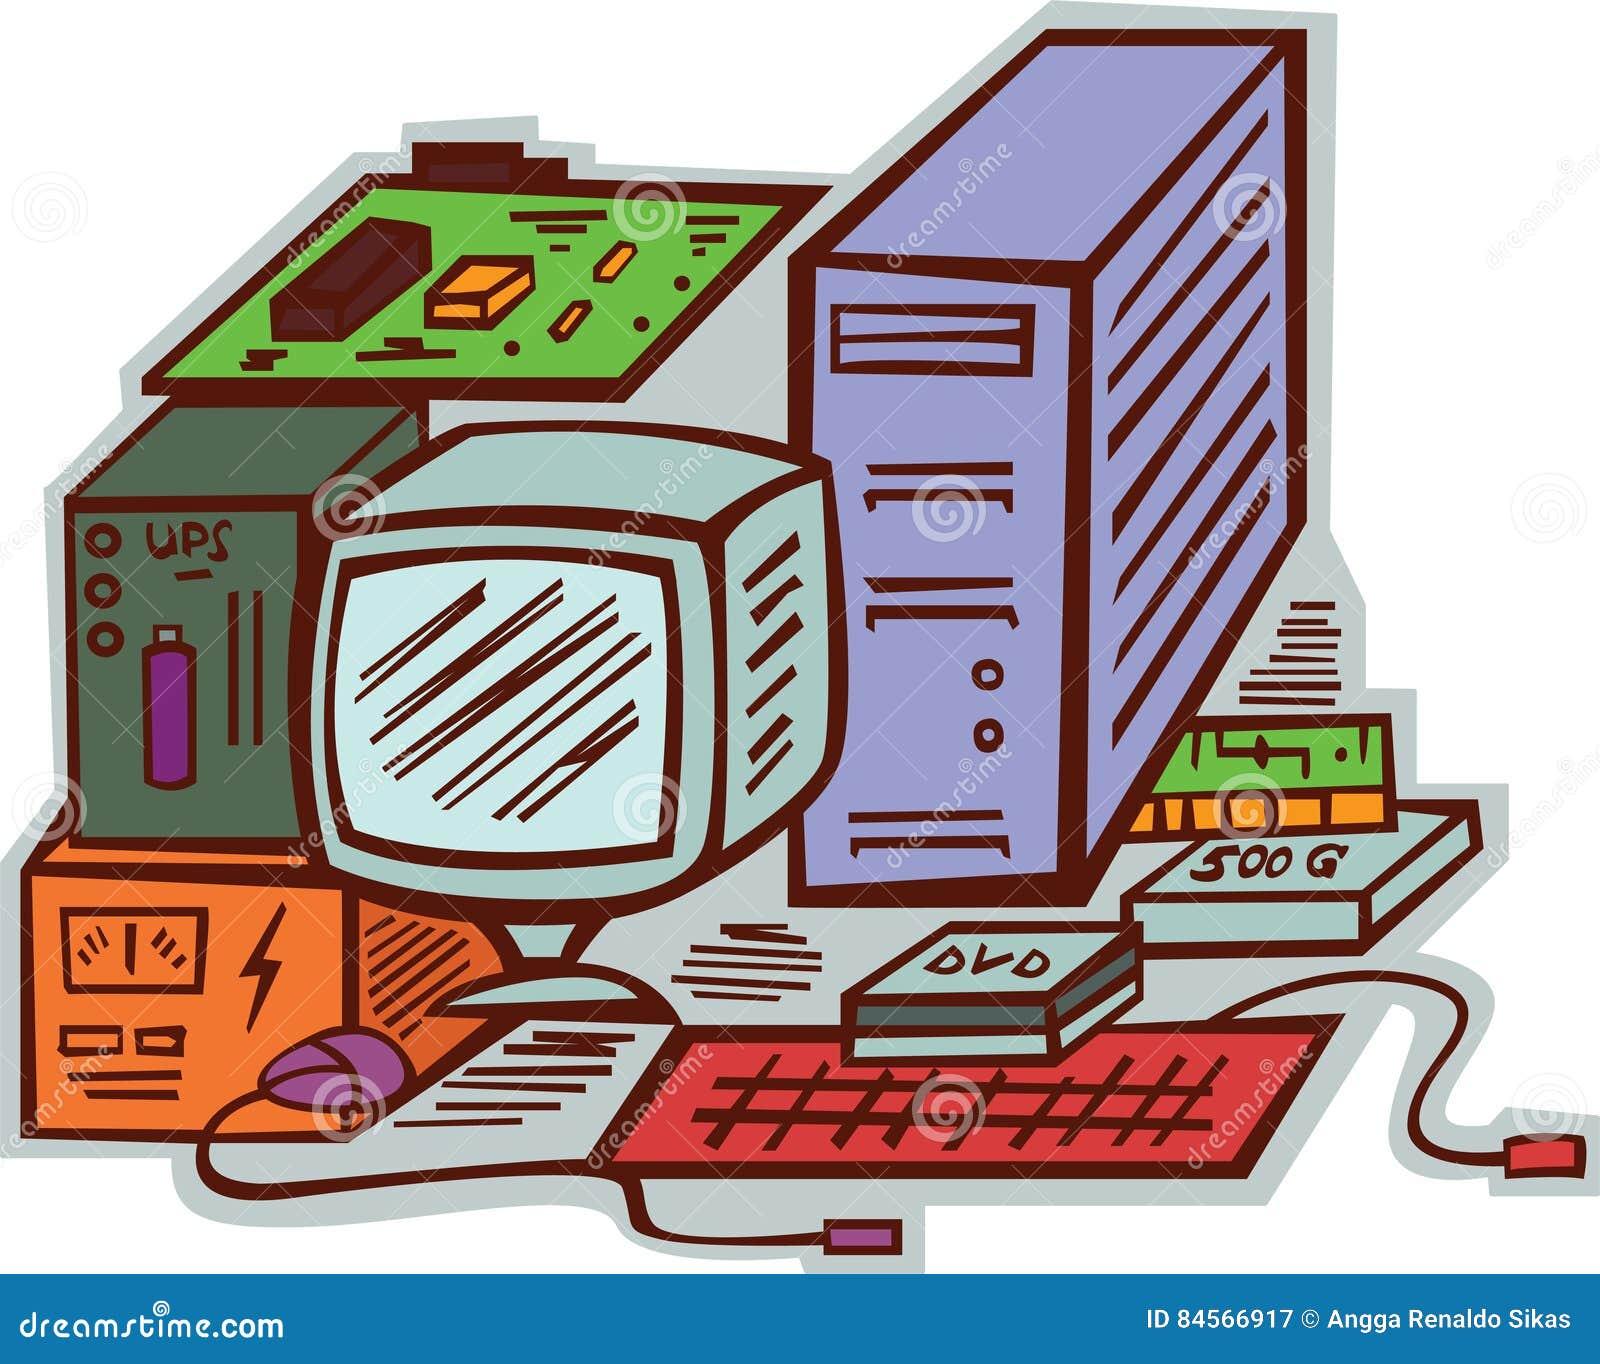 Computer Hardwares Components And Accessories Cartoon Illustrati Basic Parts Diagram